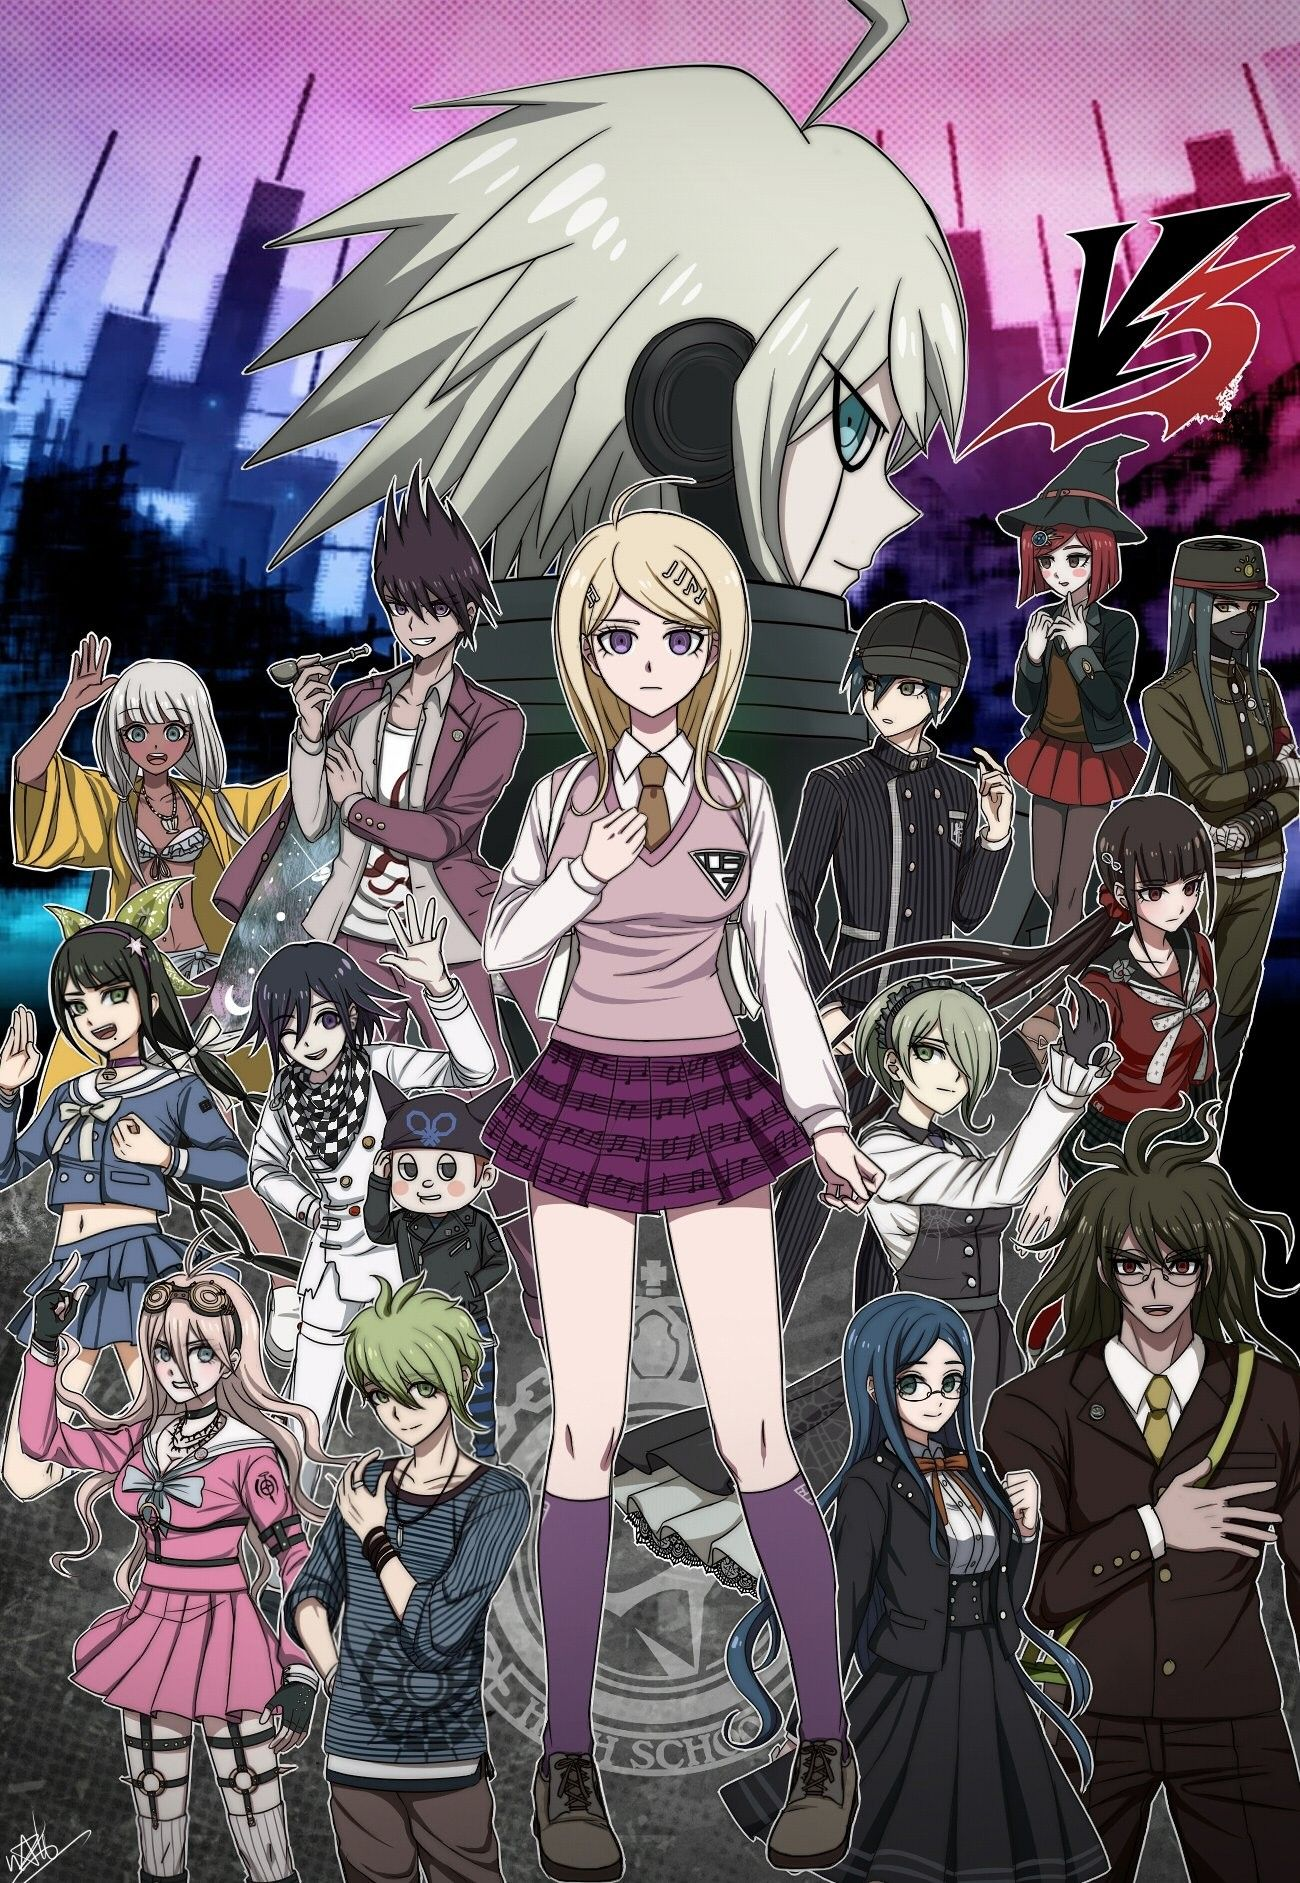 Danganronpa 3 Anime Characters : New danganronpa v killing harmony image